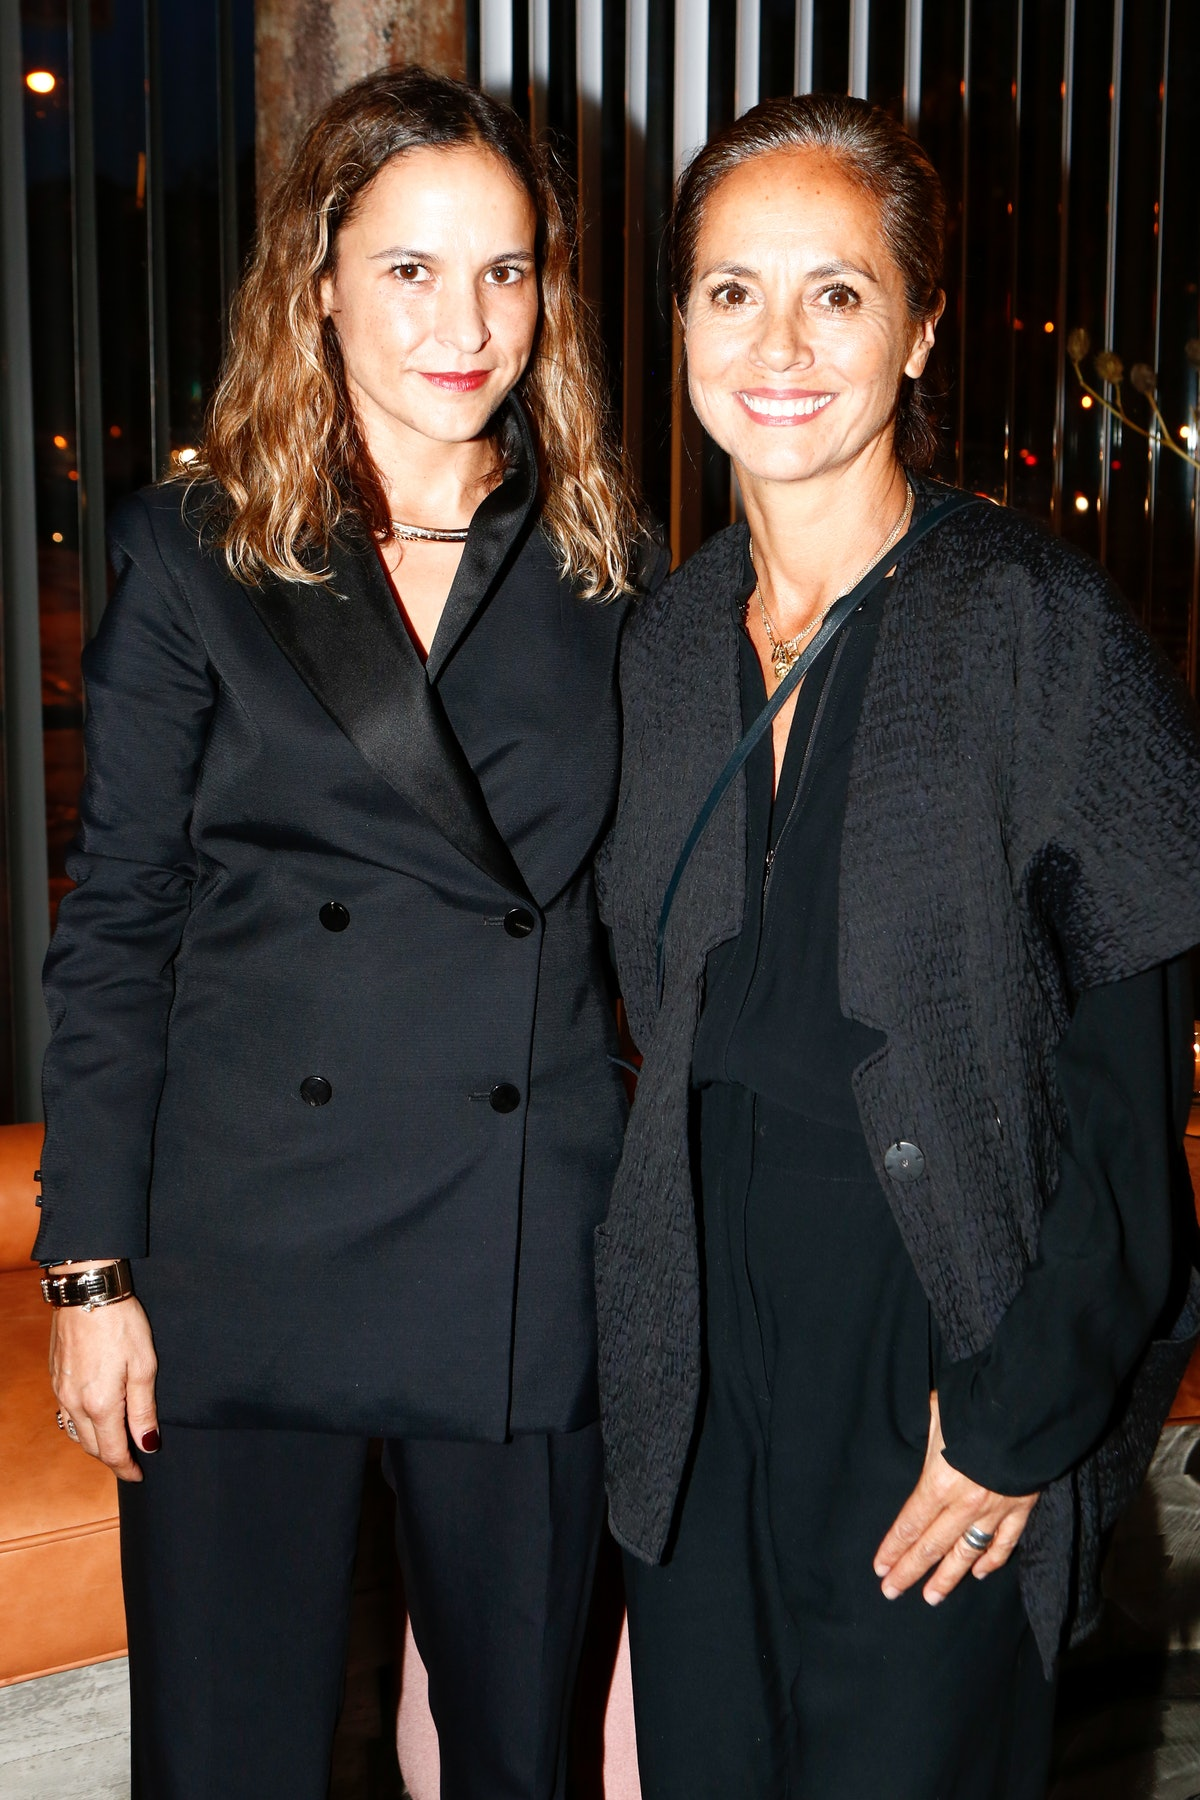 Maria Cornejo and Sara Beltran